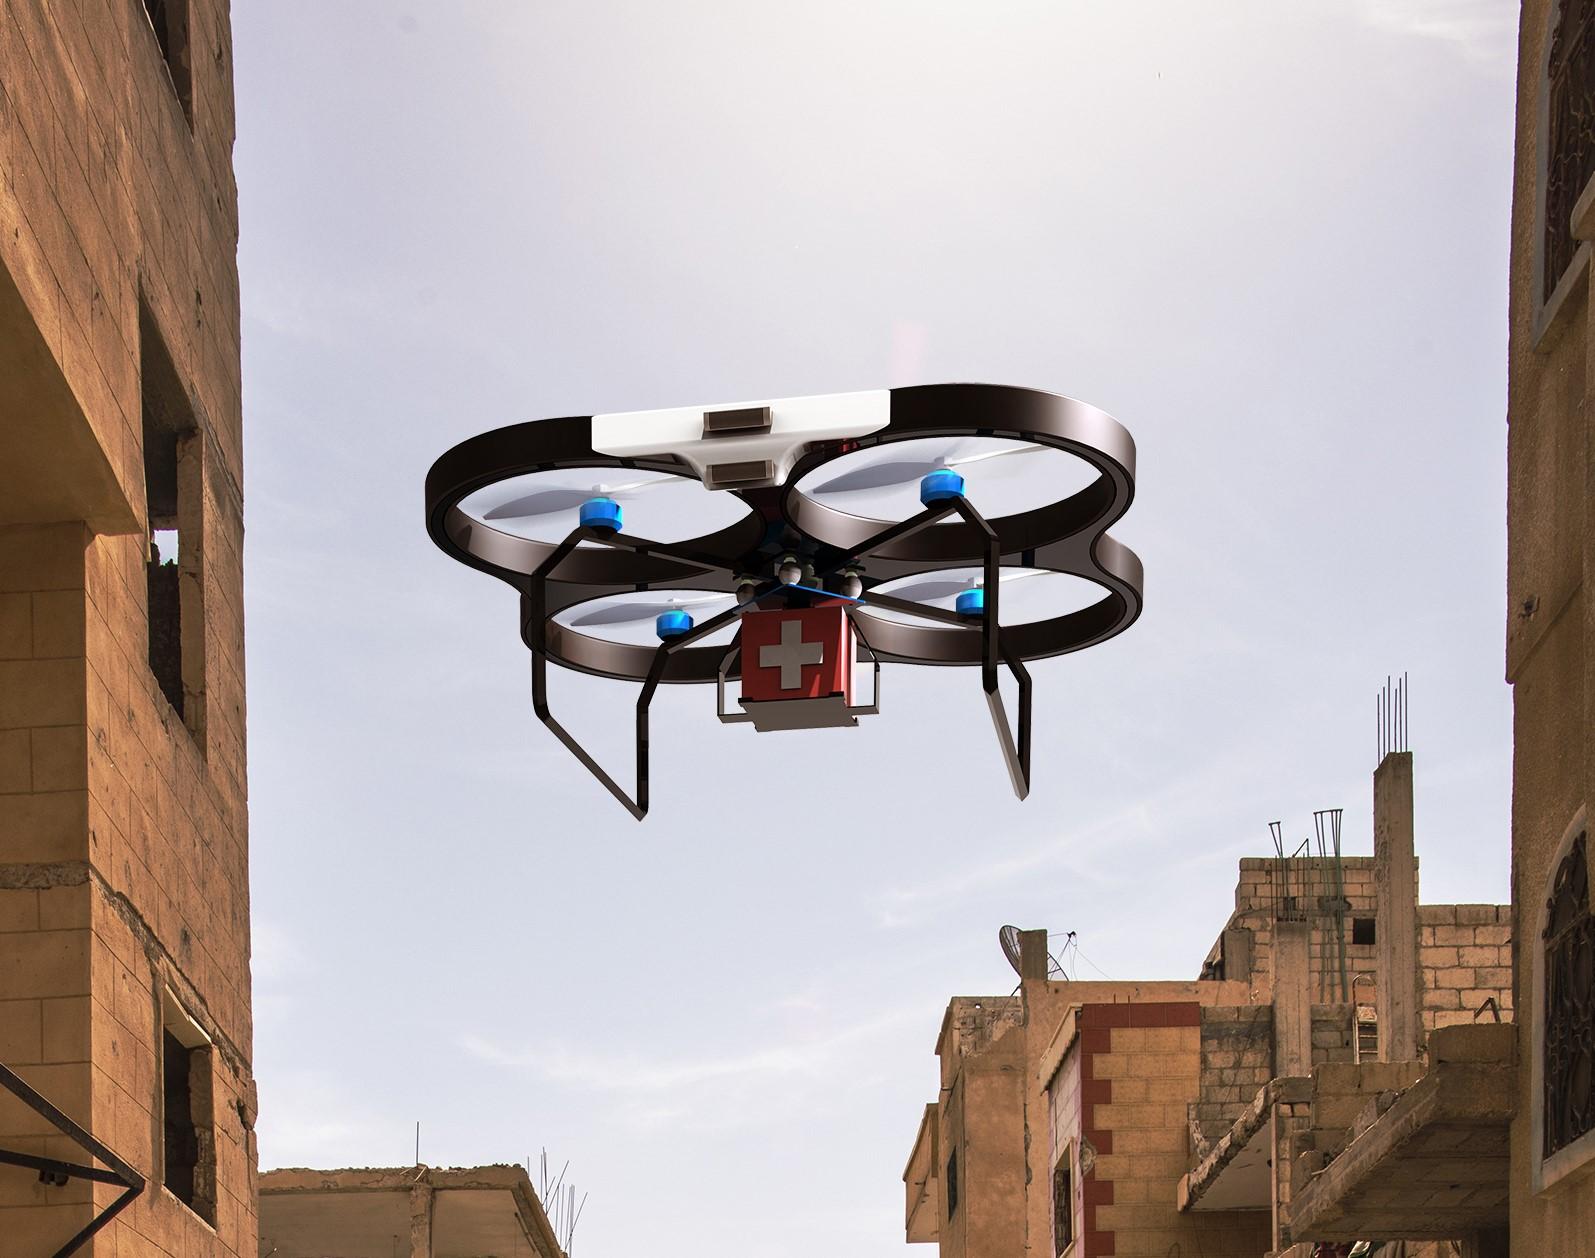 mmWave Radar Defence Drone